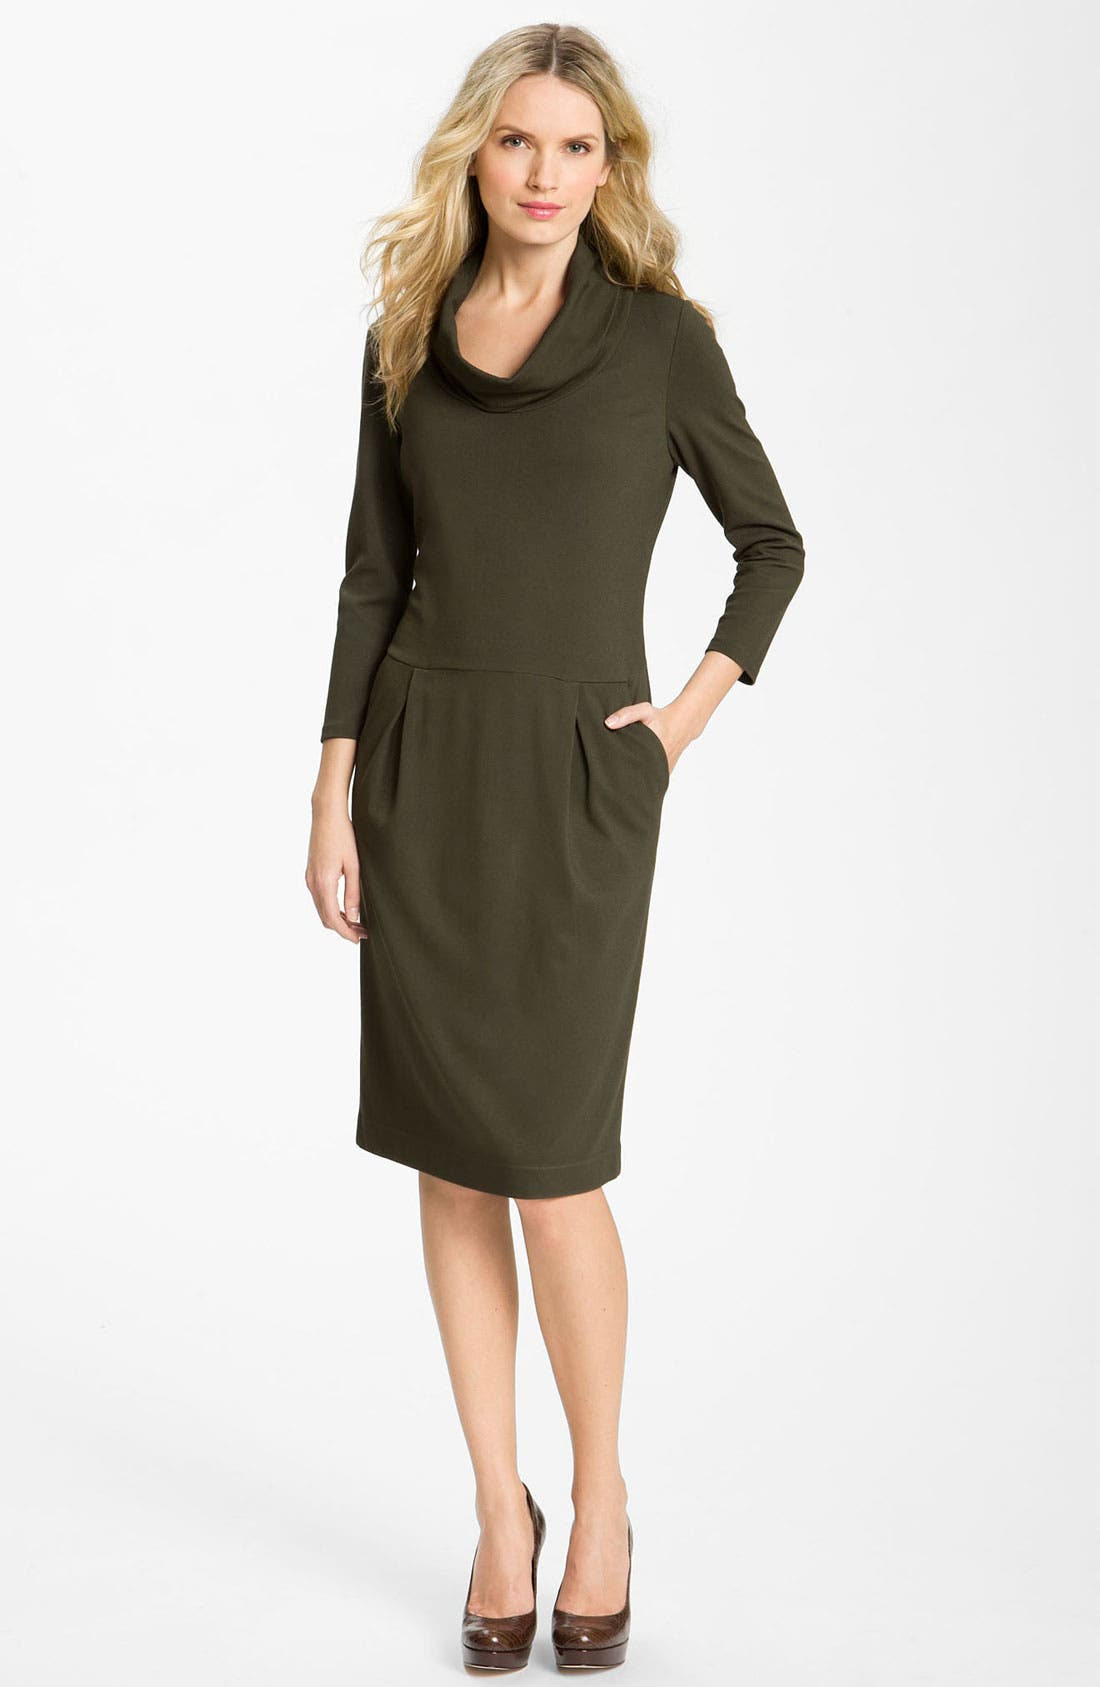 Alternate Image 1 Selected - Lafayette 148 New York 'Milano' Cowl Neck Dress